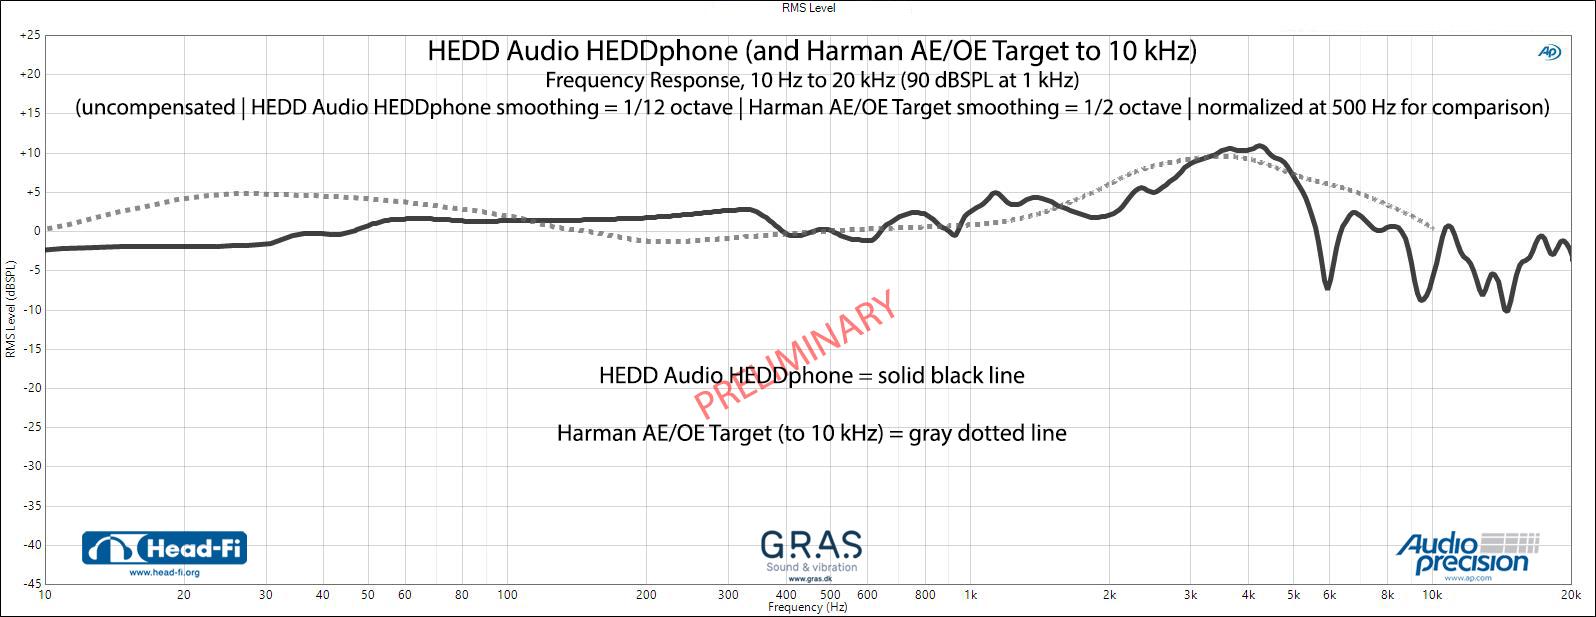 HEDD_HEDDphone_Measurements_Frequency_Response_PRELIMINARY_and_Harman_AE-OE_Target.jpg